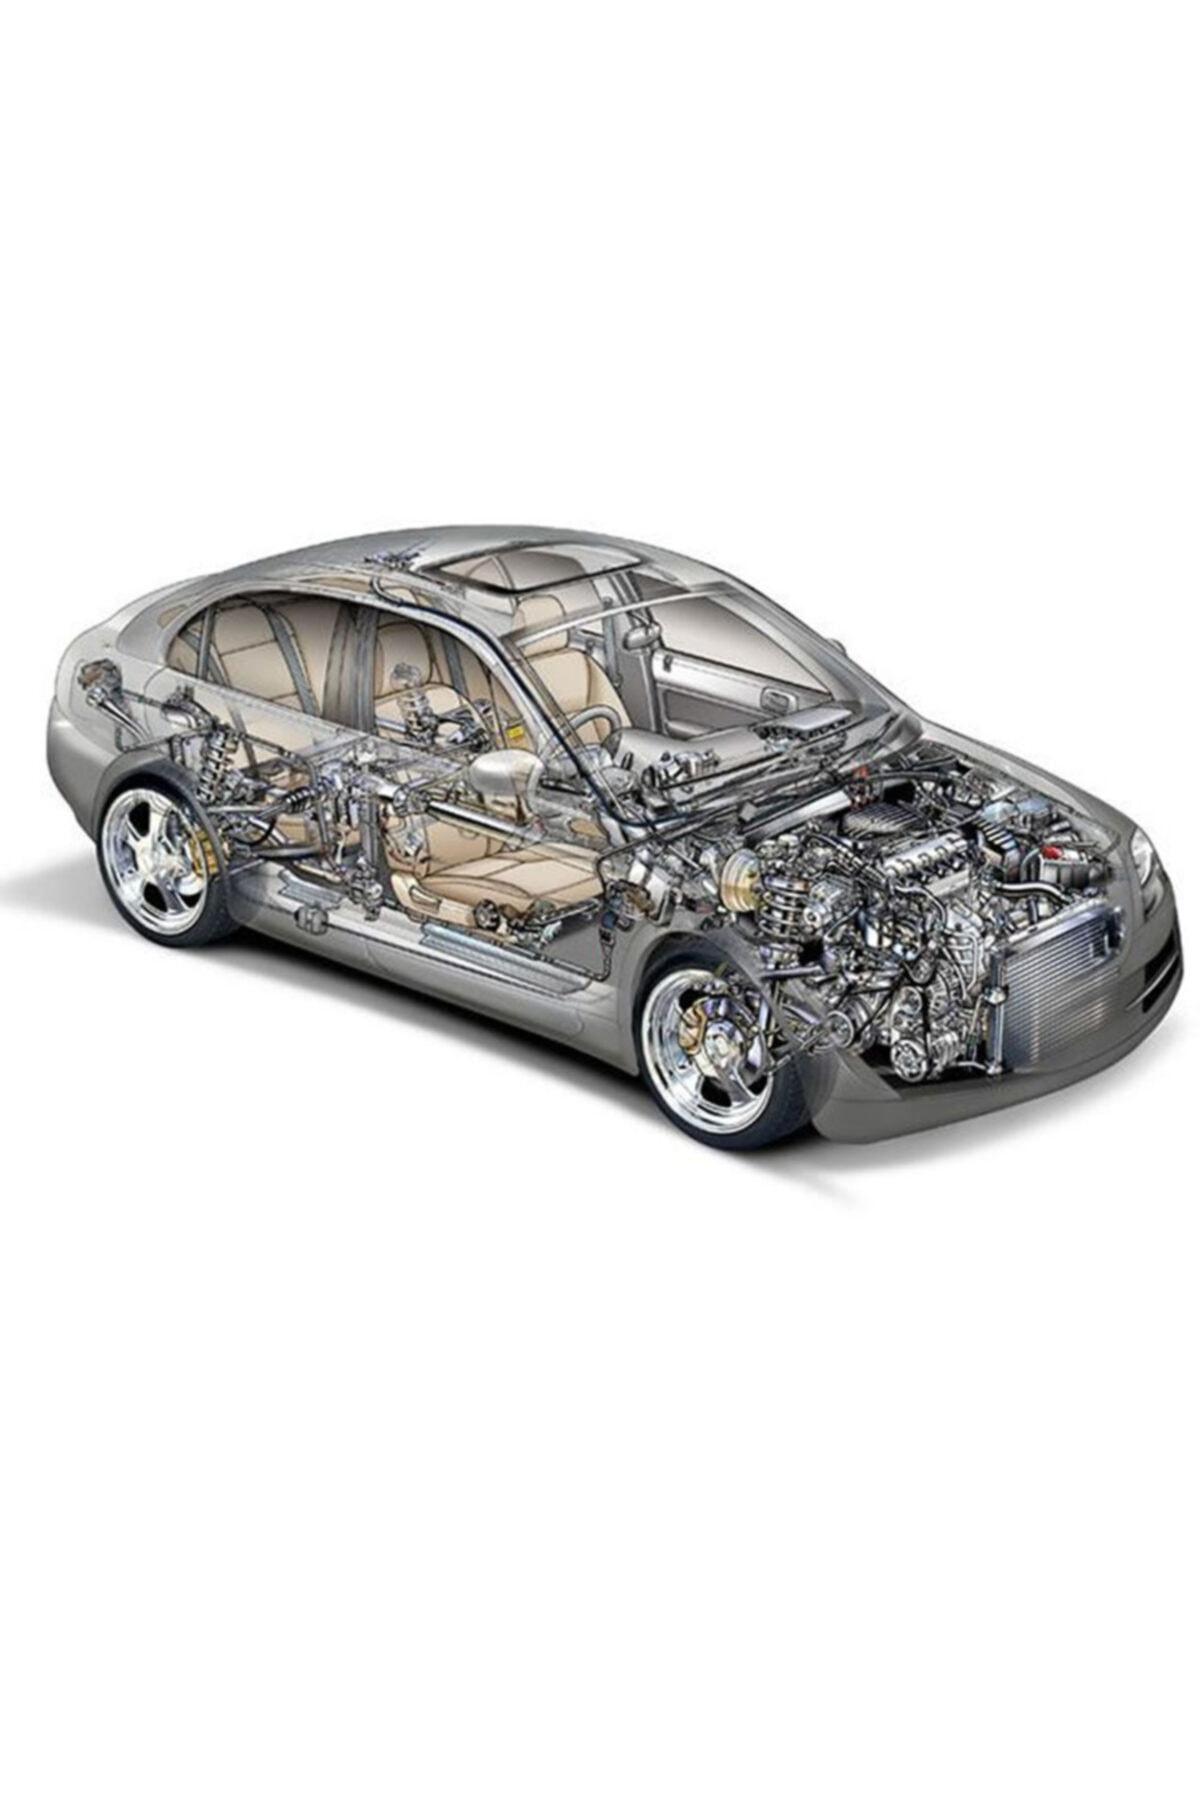 MAHLE Motor Piston Segman 75,00mm Std P106-p206 Tu3a-114w7, 0118l4, 9561968180, 1